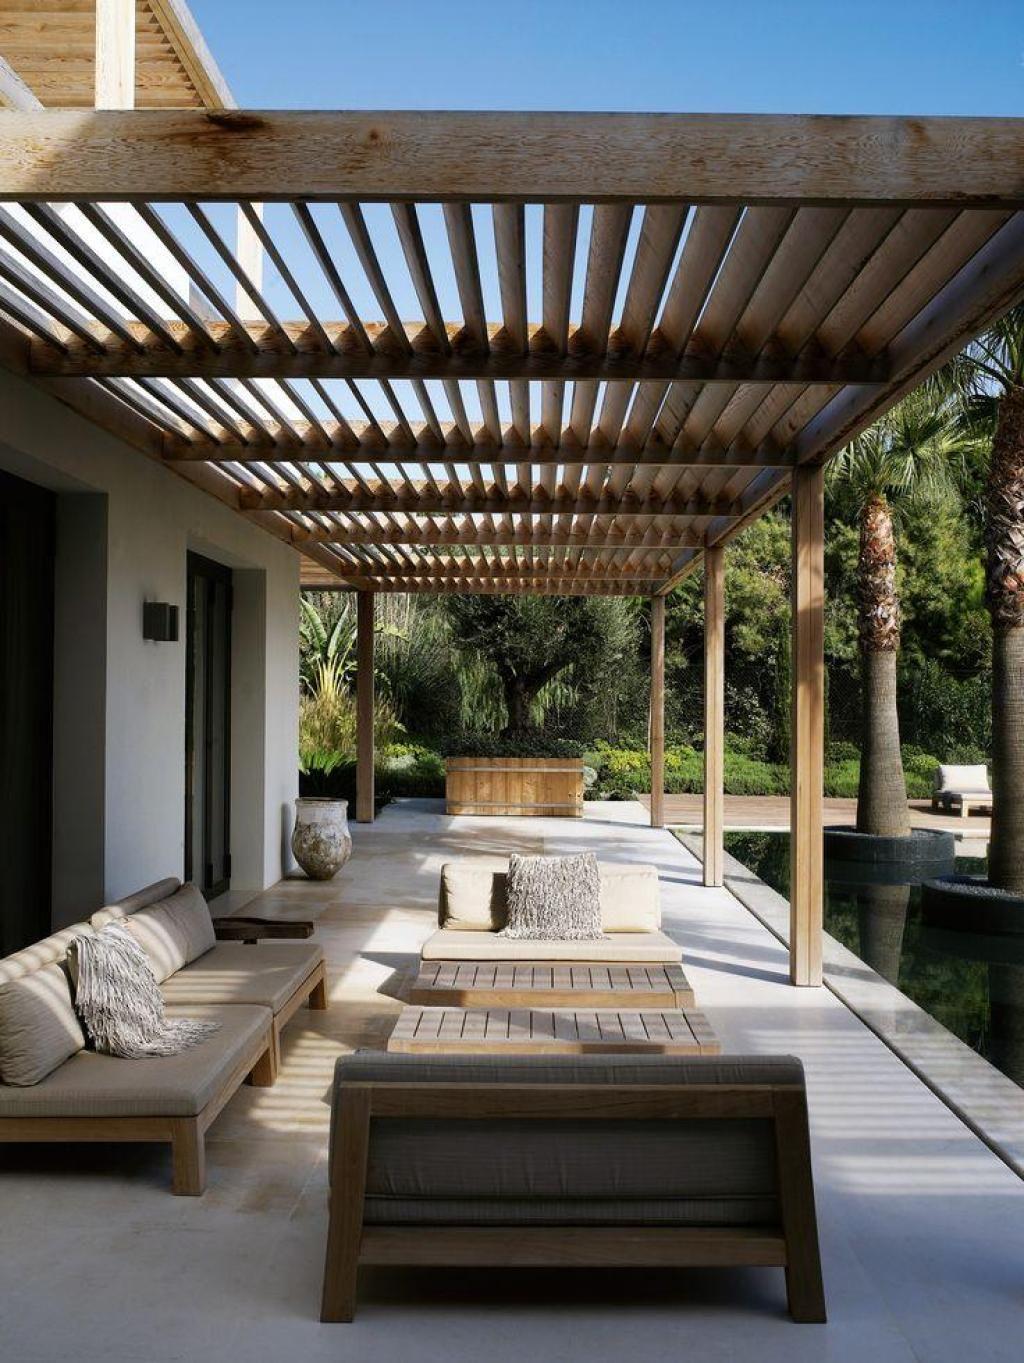 modern patio design ideas Pin by www.tapja.com on outdoor design | Pergola patio